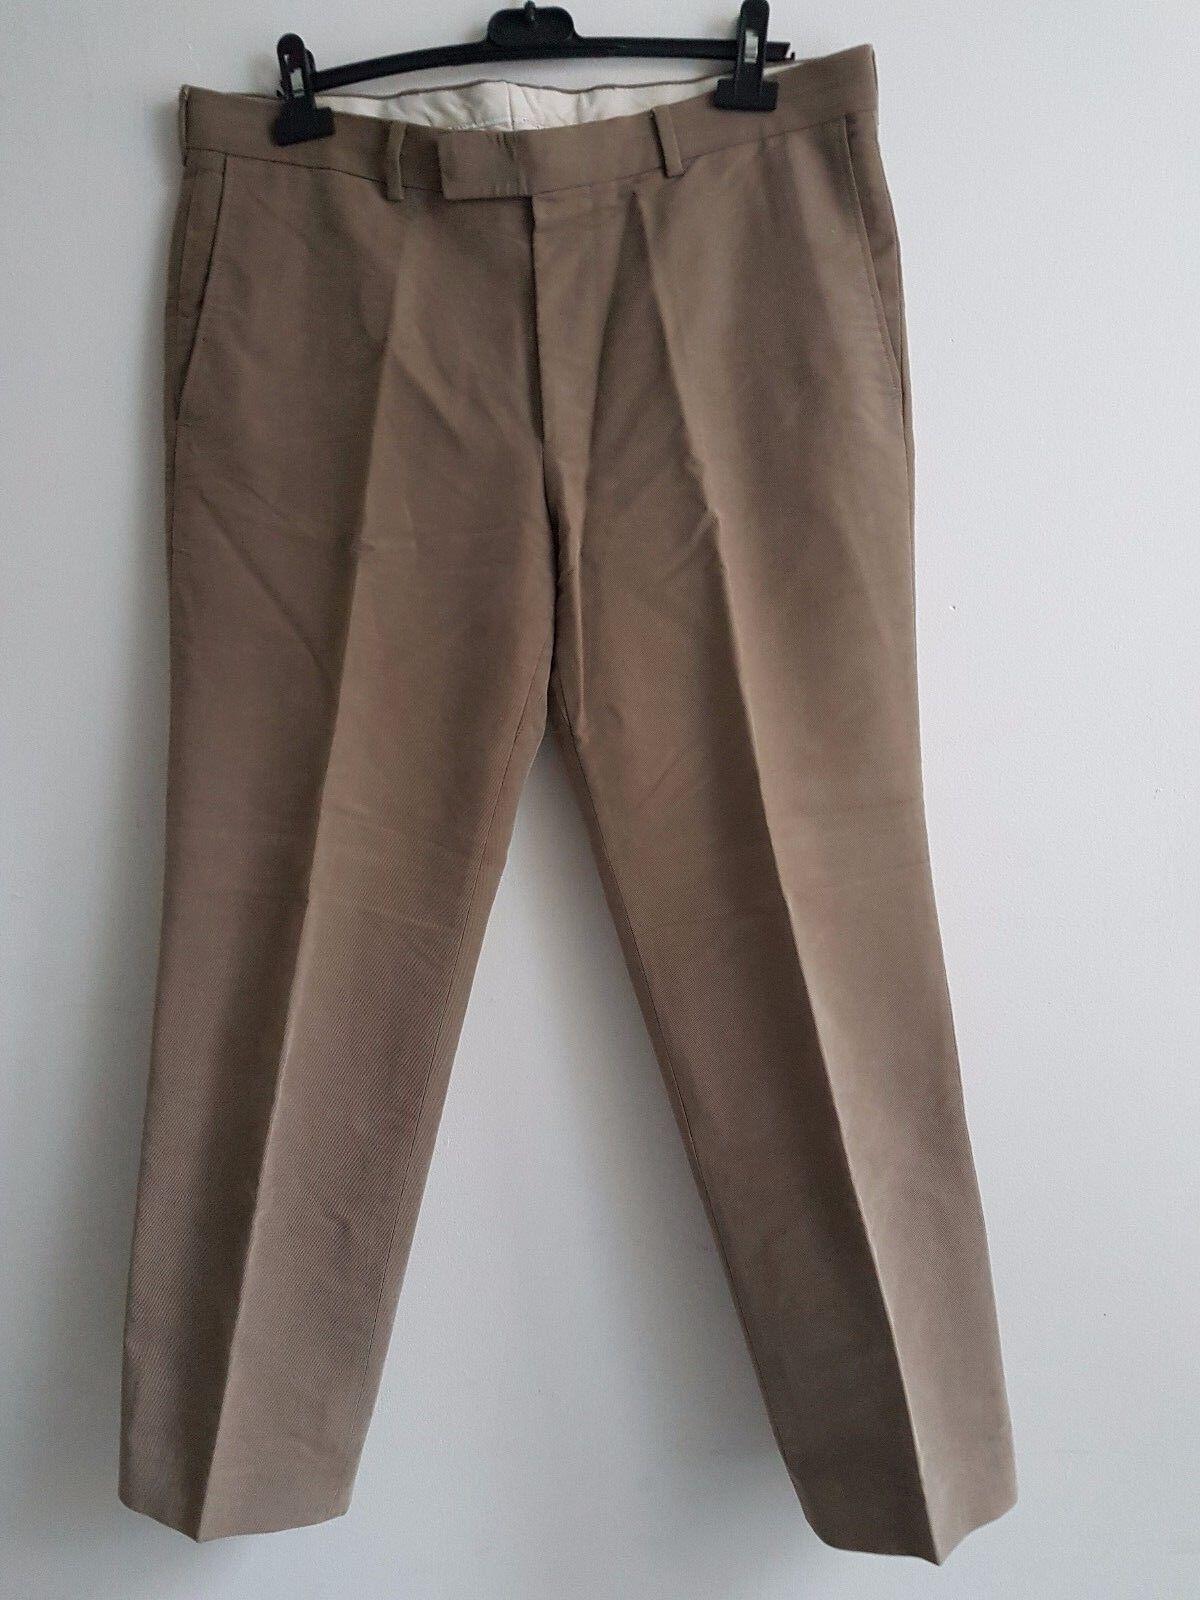 Hugo Boss Men's Parker- Chino Beige Trousers -Größe 52  L30 Smart Great condition